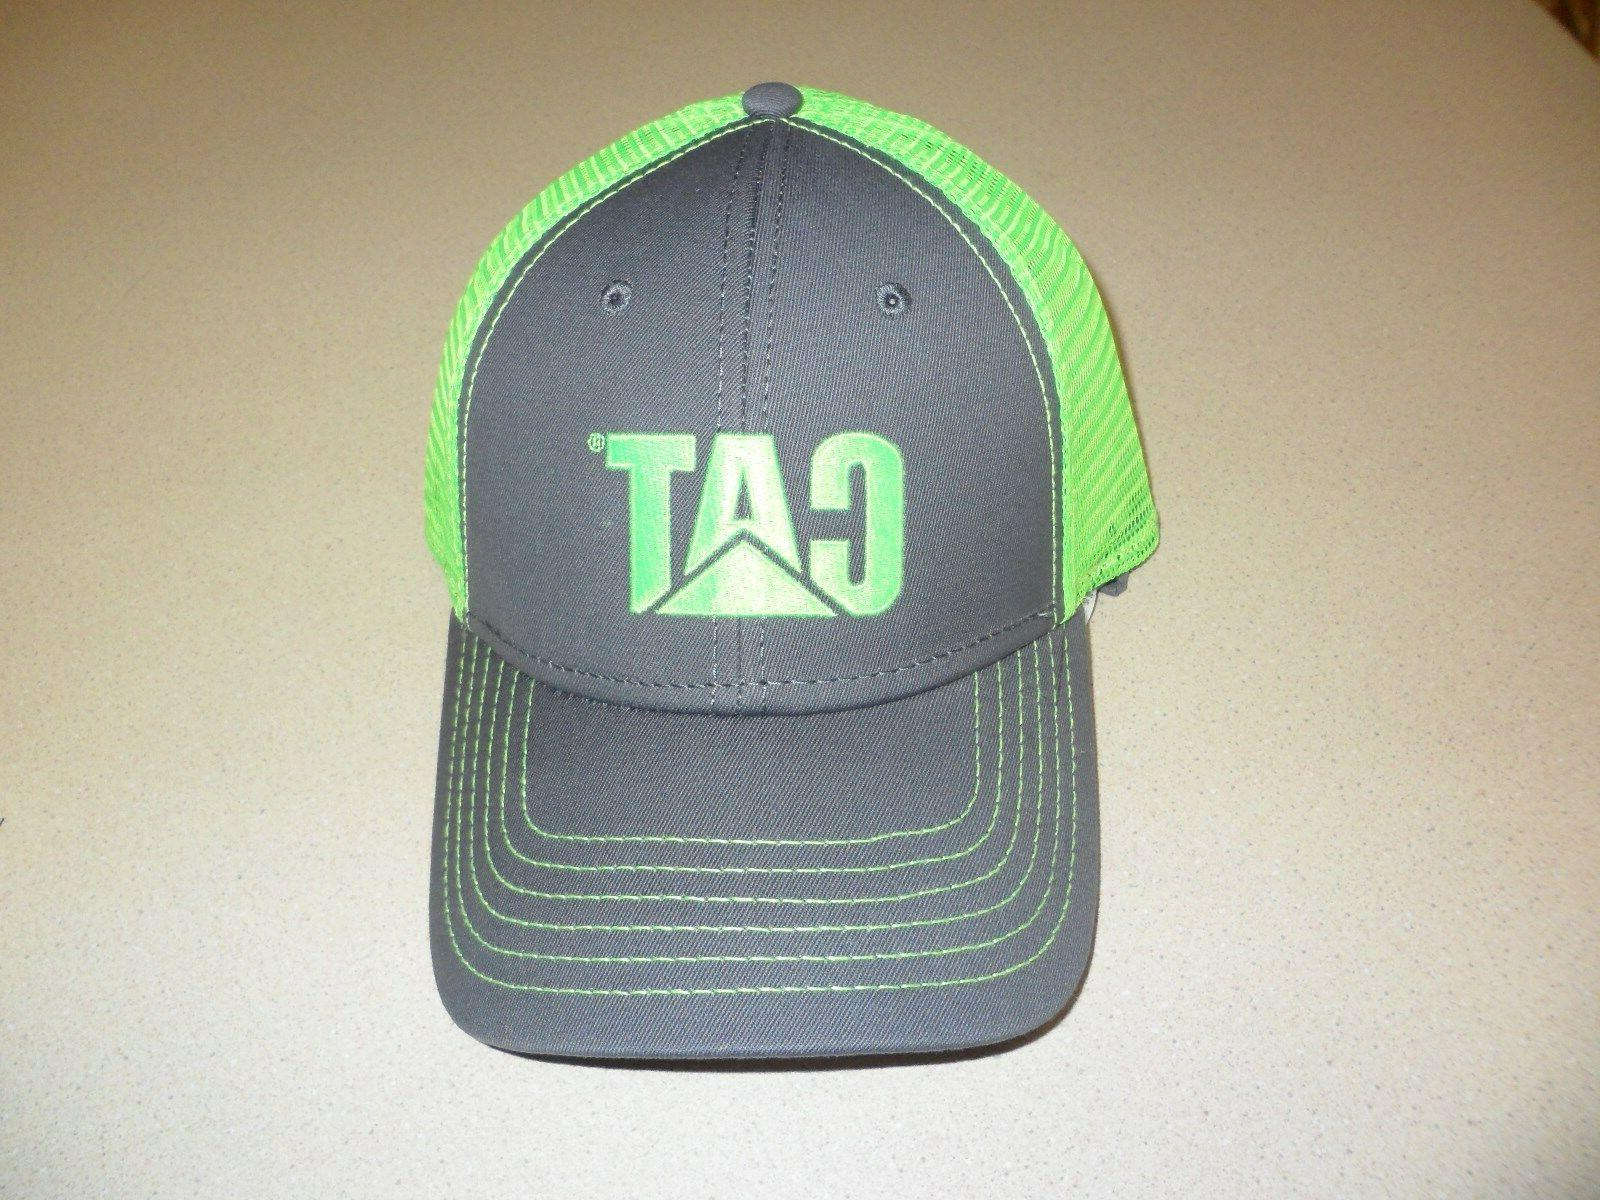 Caterpillar Charcoal Hat Neon Green CAT logo & mesh Trucker